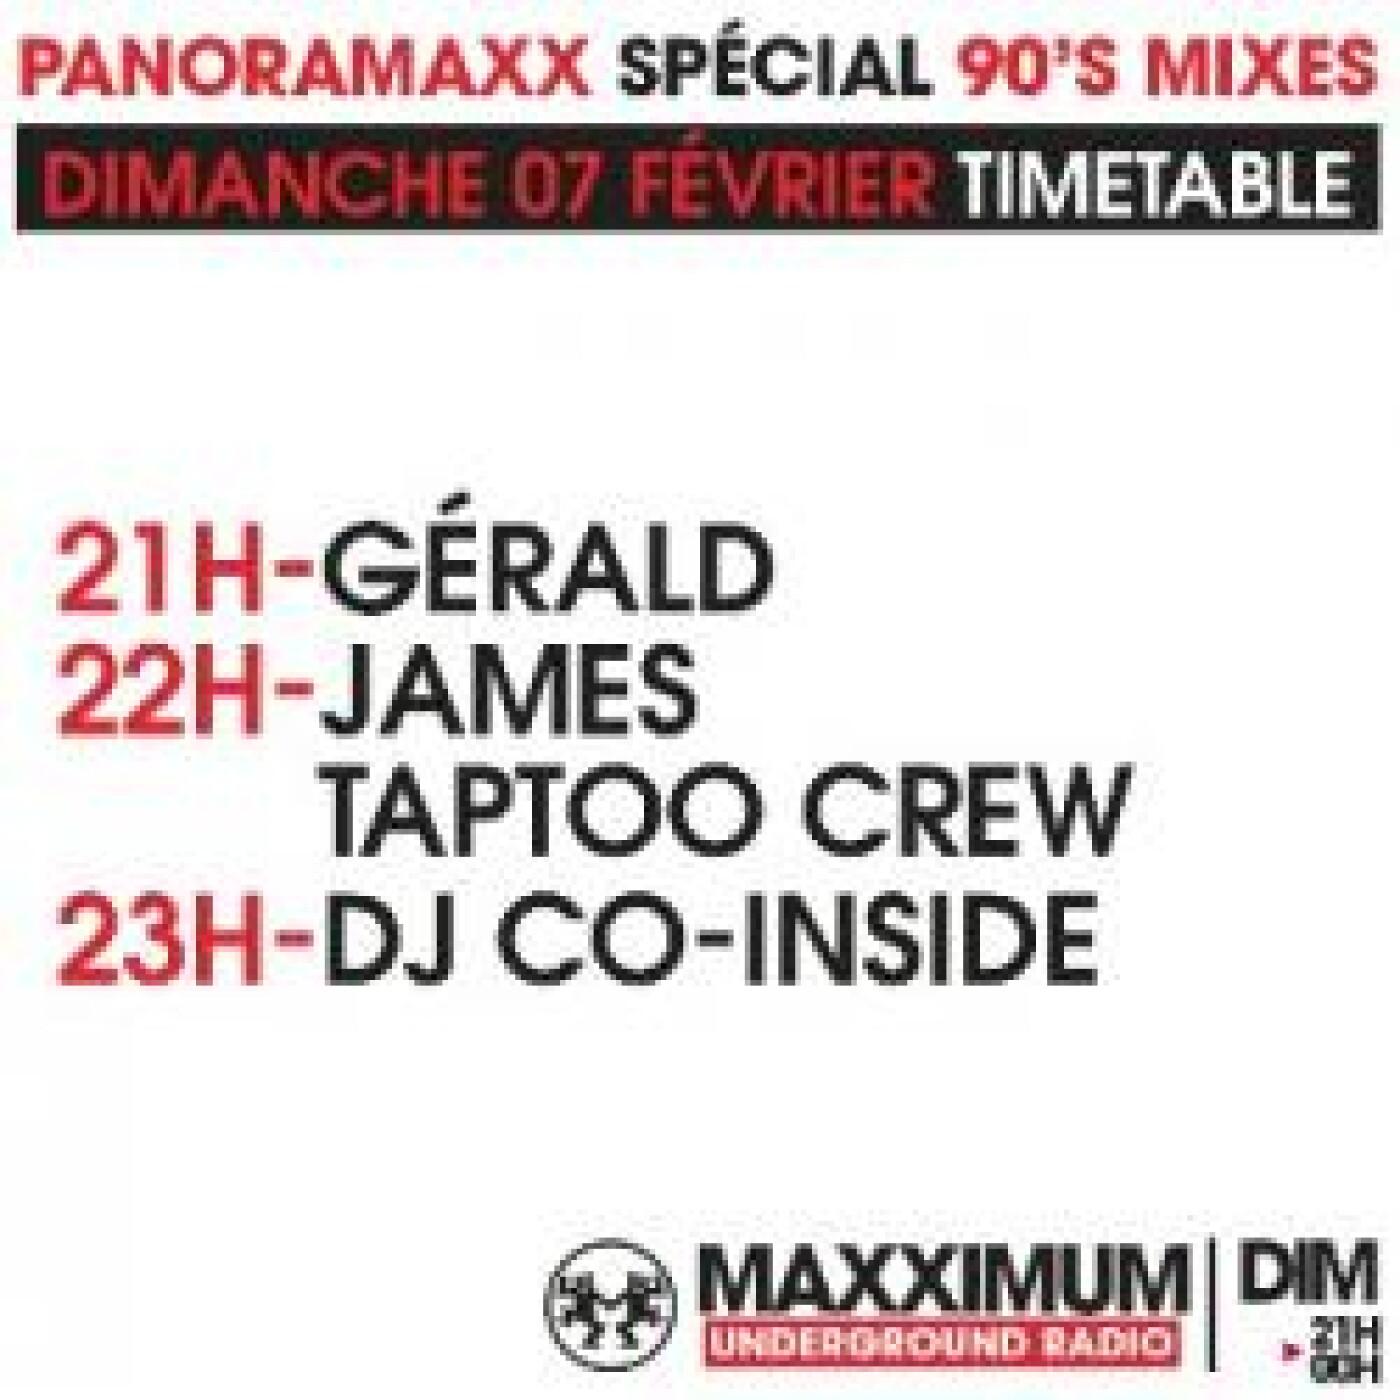 PANORAMAXX 90'S : DJ CO-INSIDE